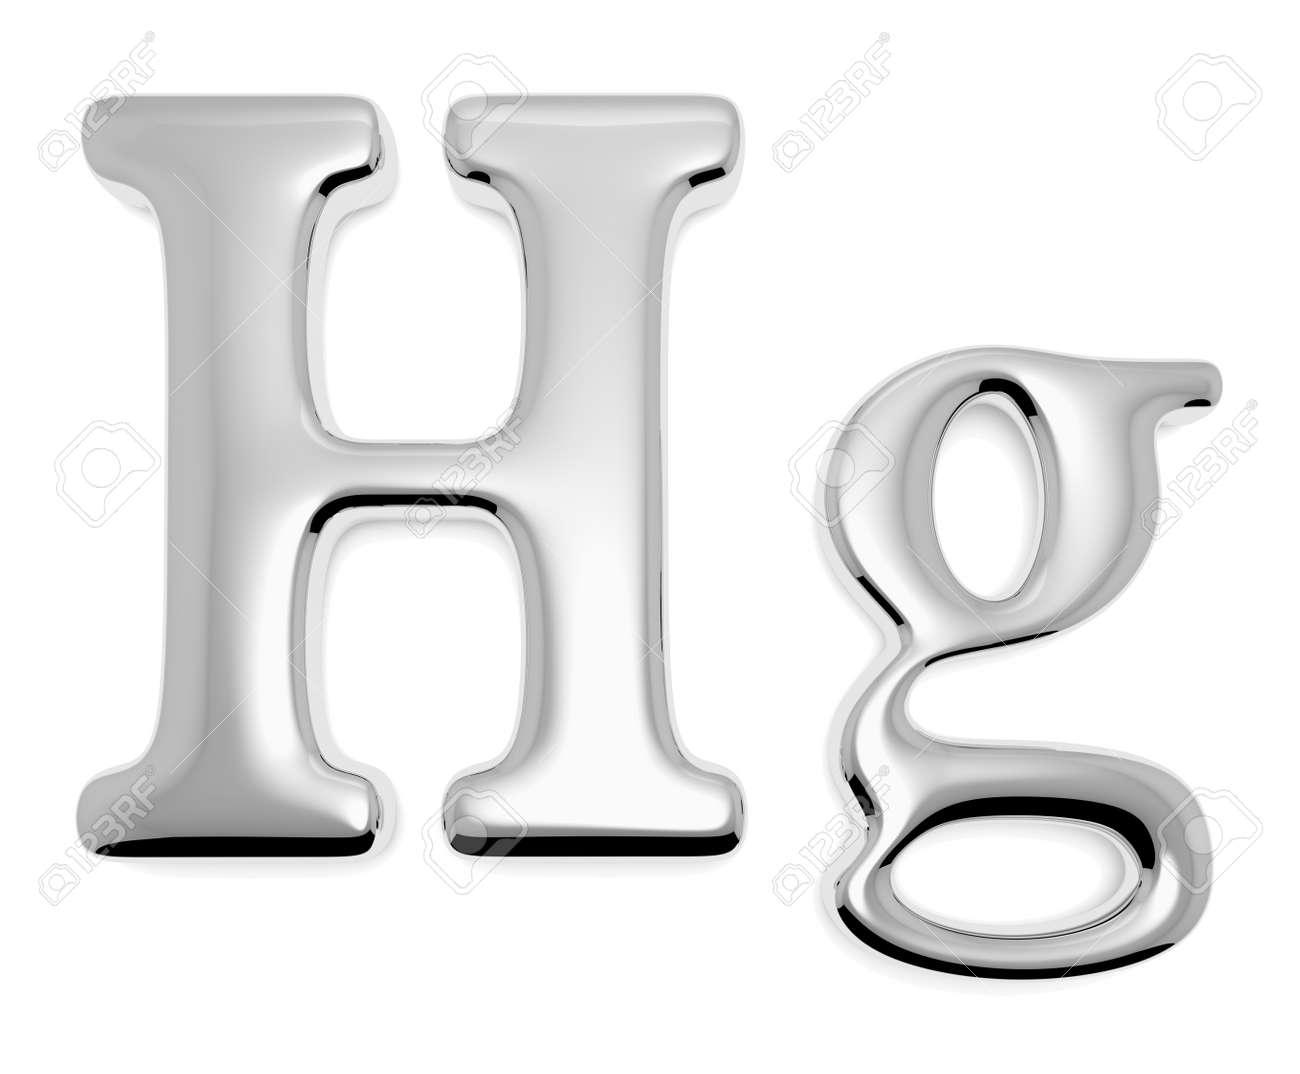 Shiny Mercury Metal Chemical Element Hg Sign Of Toxic Mercury